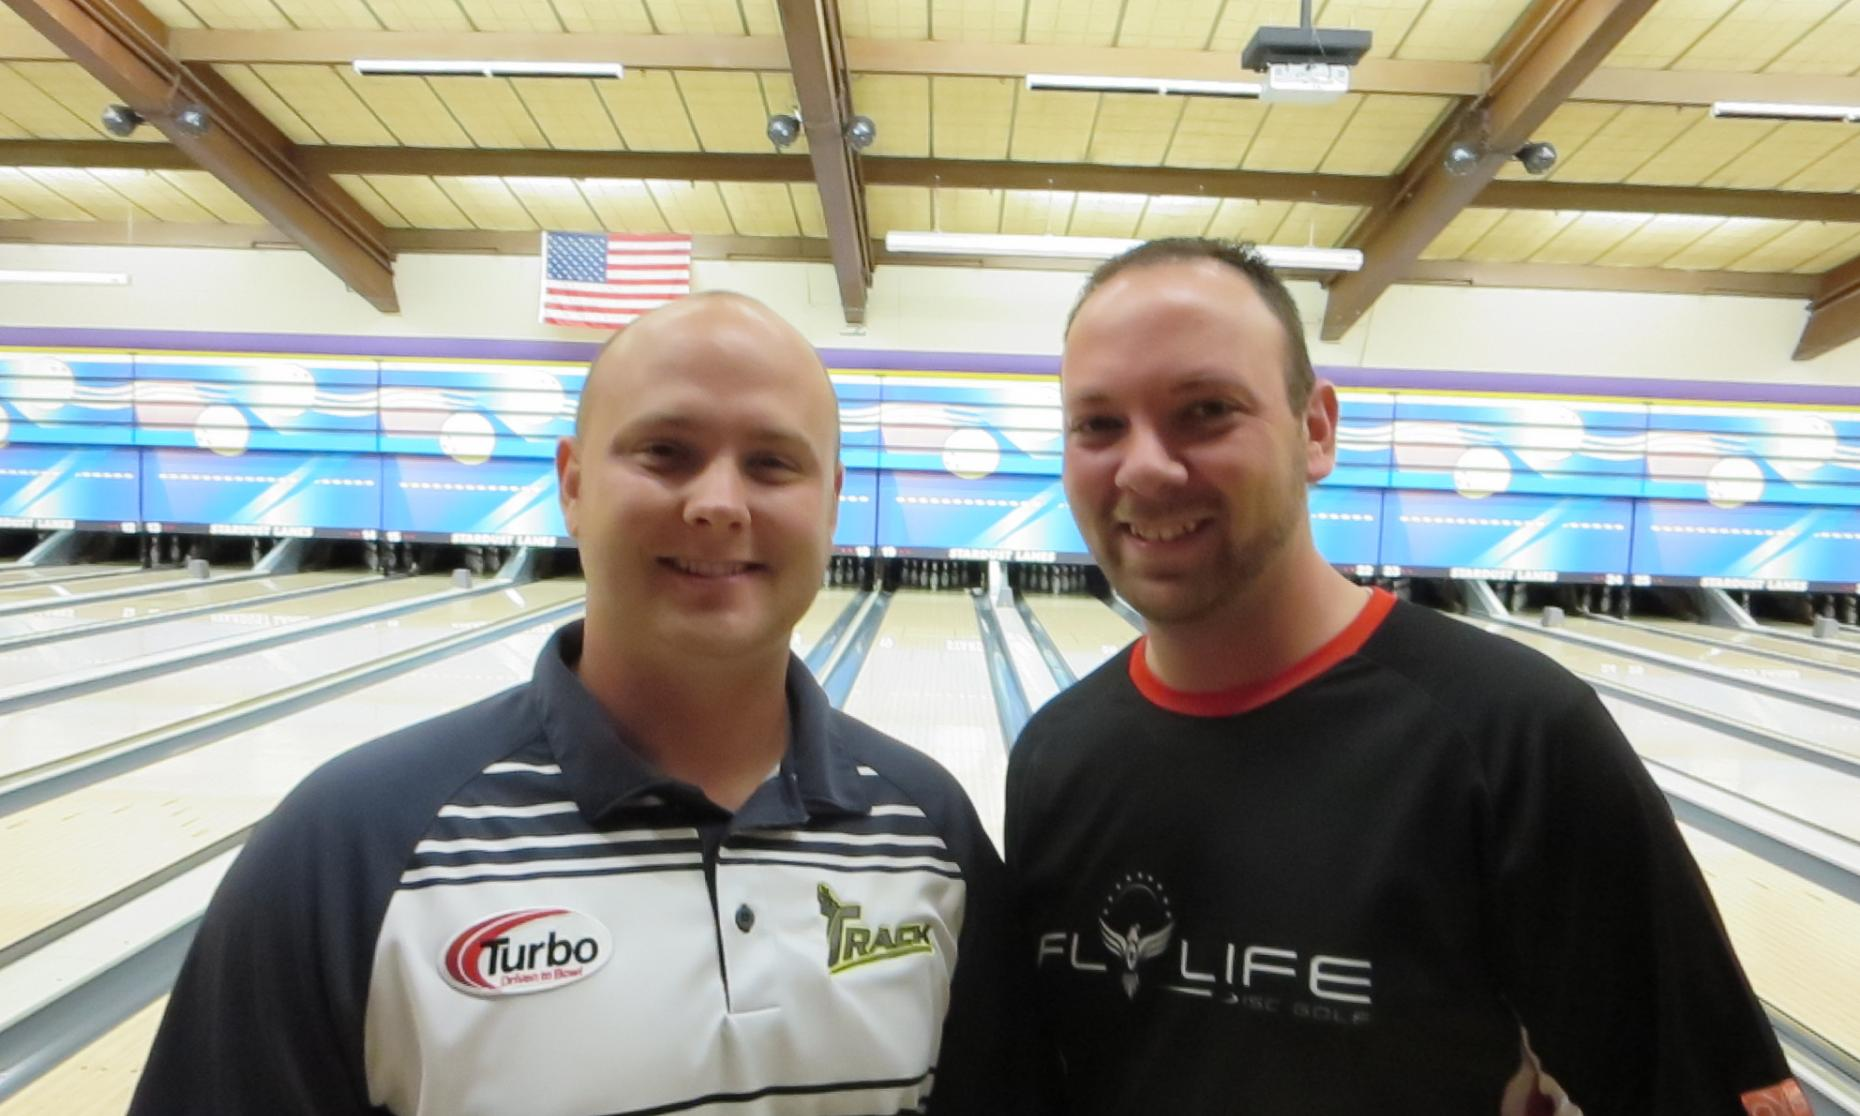 Champions Dan MacLelland and J.R. Raymond